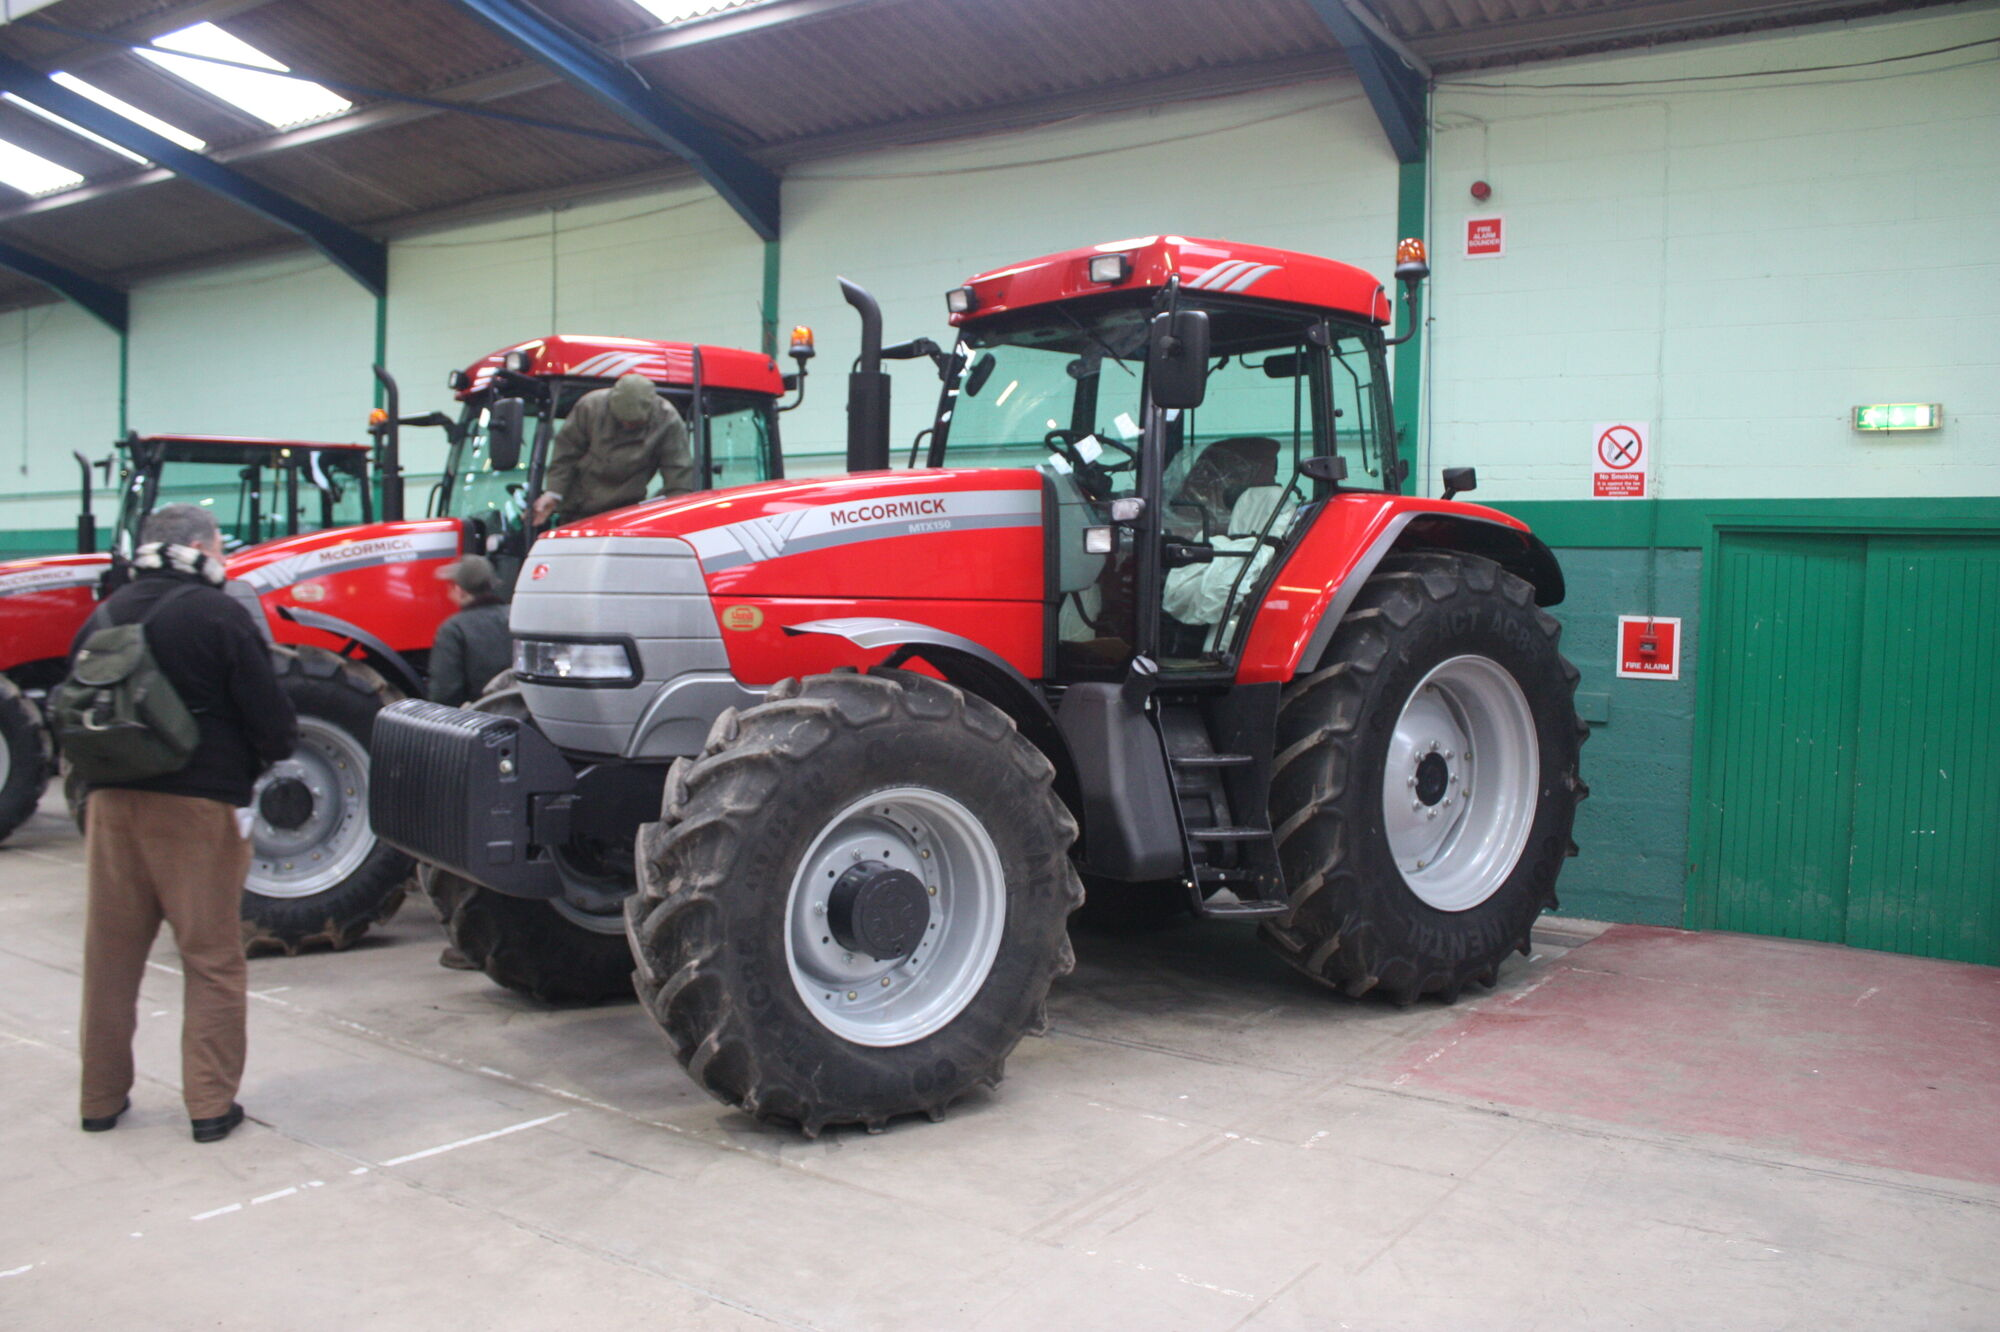 mccormick tractors tractor  u0026 construction plant wiki ford 4610 fuse box